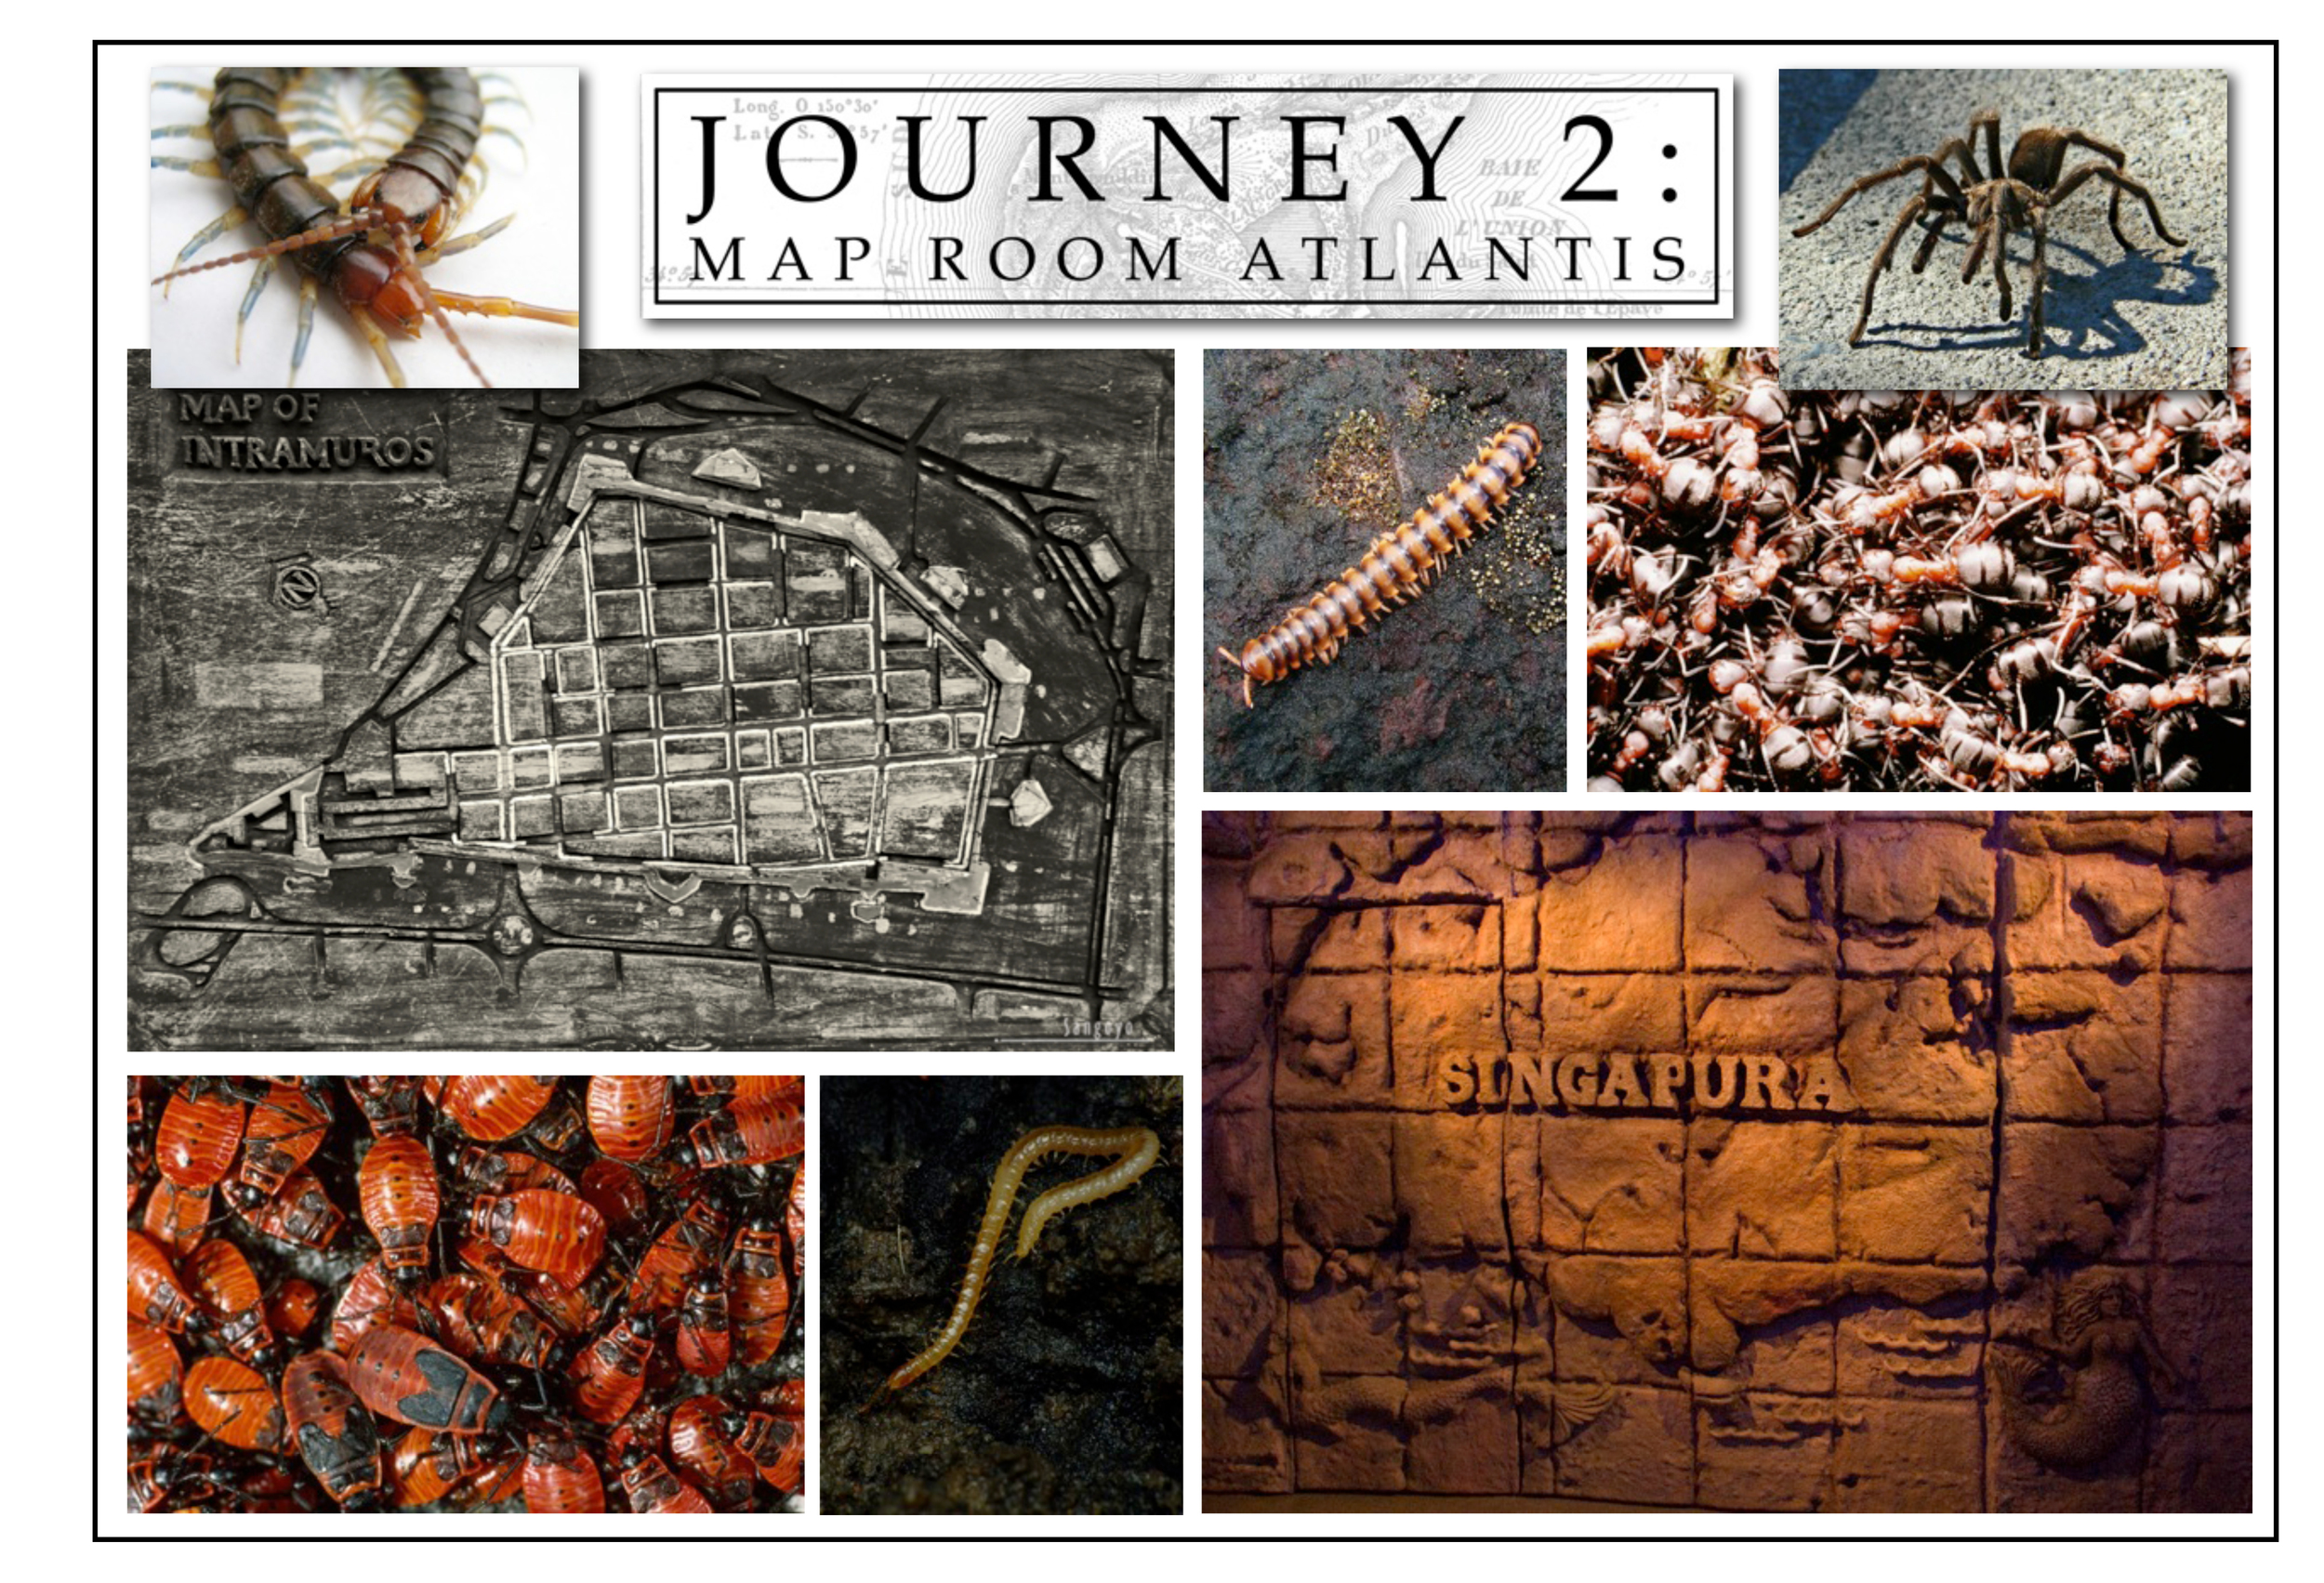 JourneyBoards041610-48.jpg